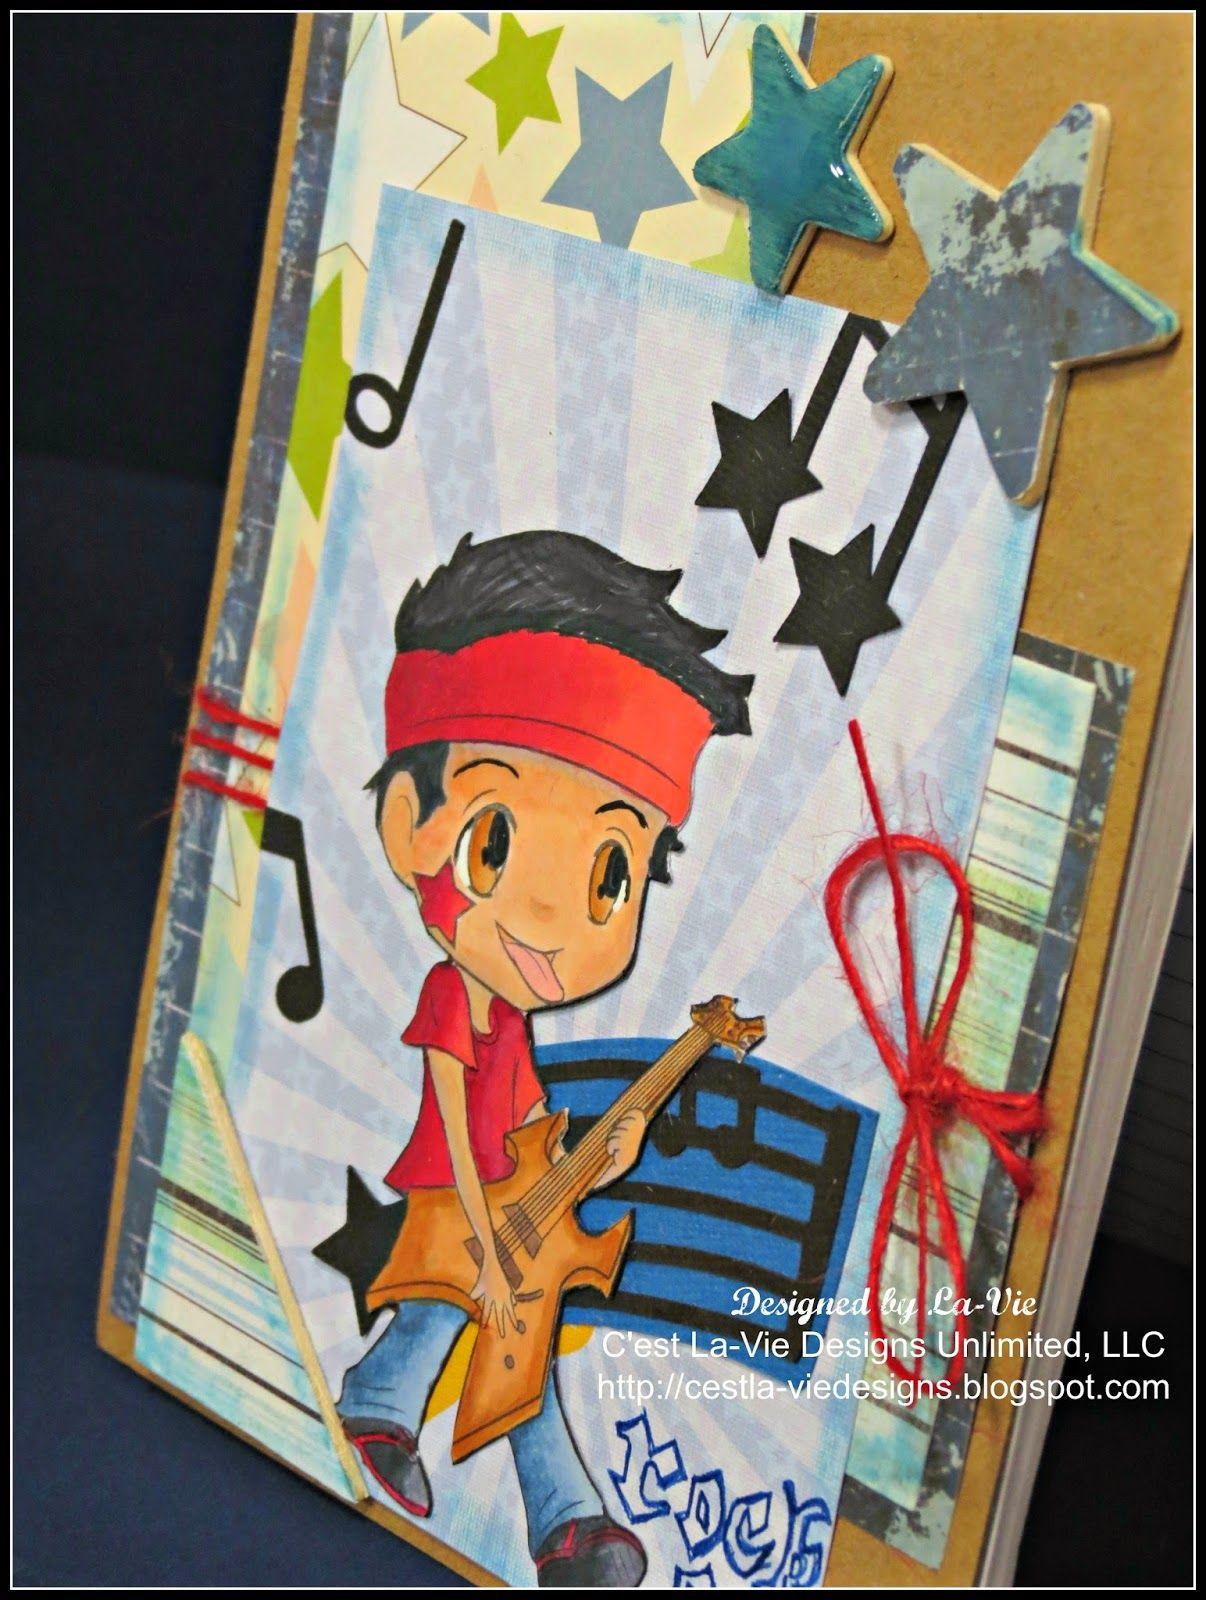 C'est La-Vie Designs Unltd., LLC: My First DT Post for Lil Patch of Crafty Friends Challenge #7 - Anything goes